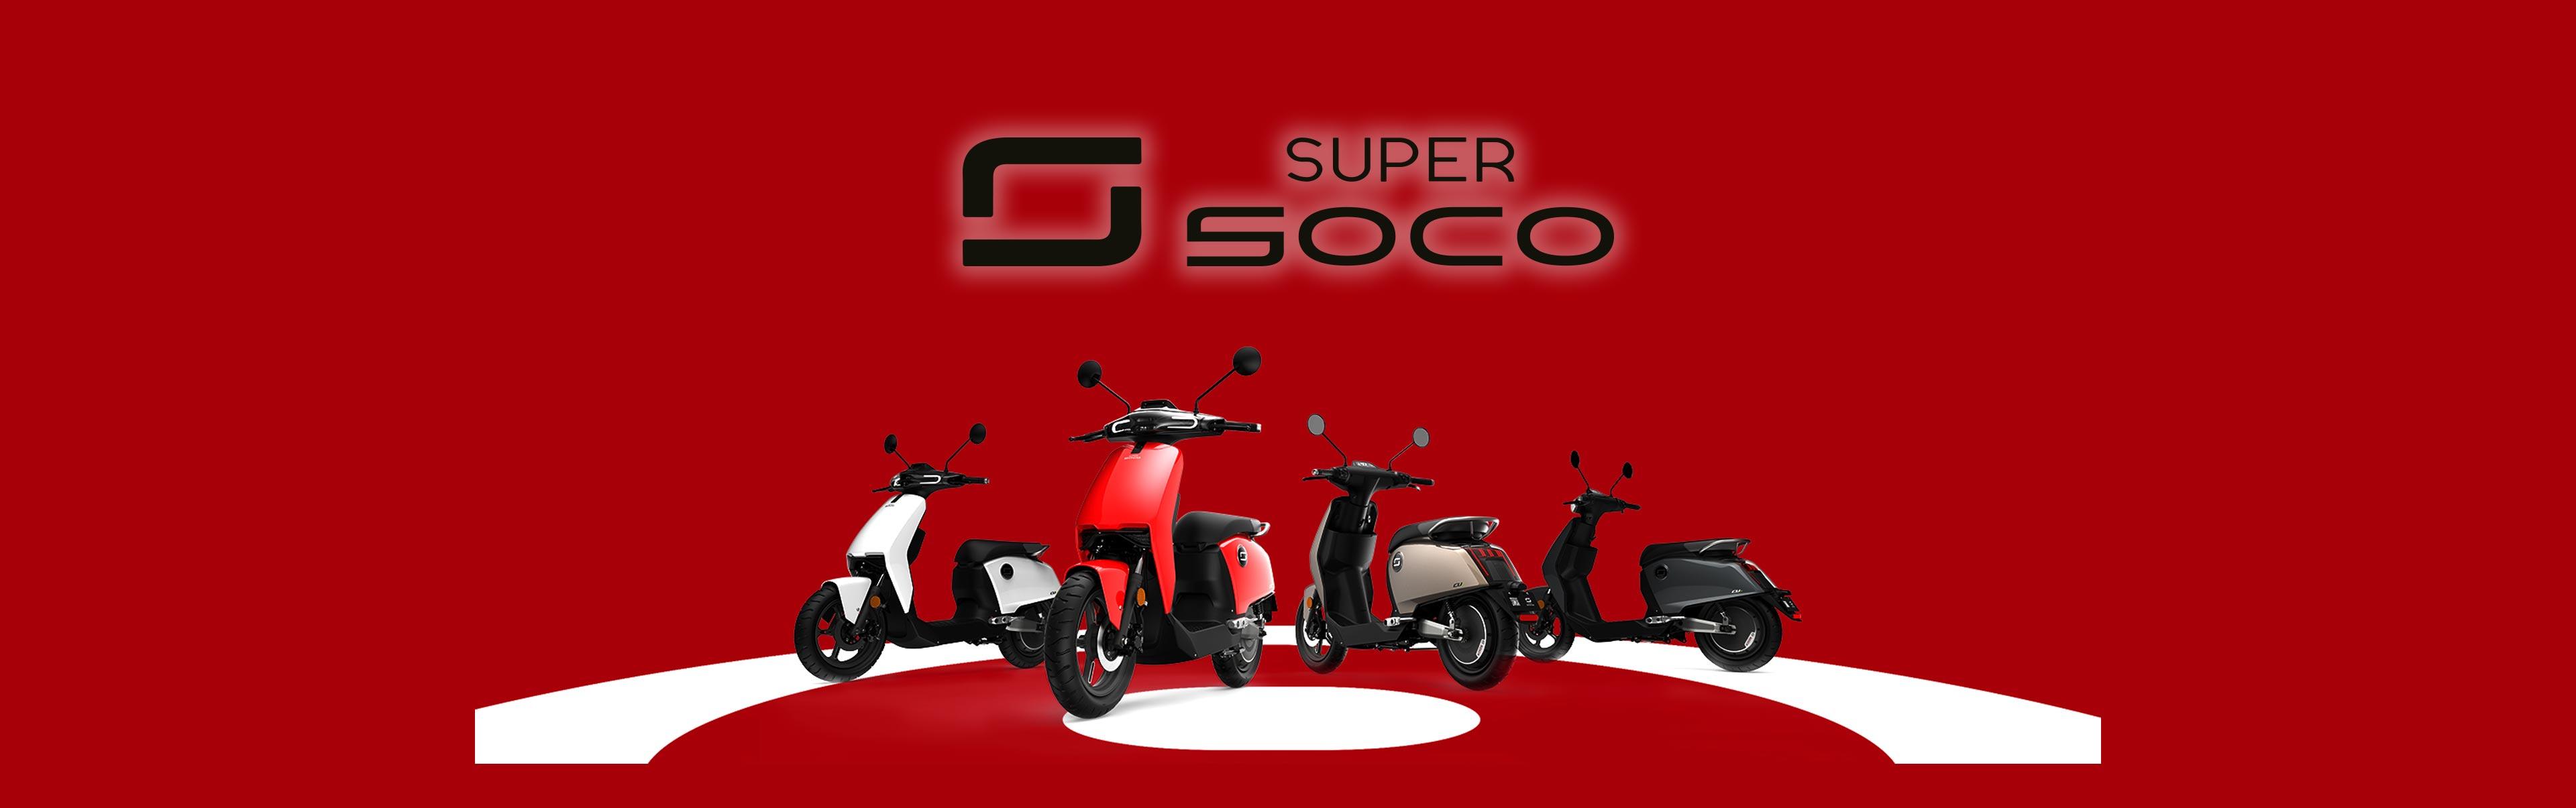 efuture_slider_supersoco_cux_1515220